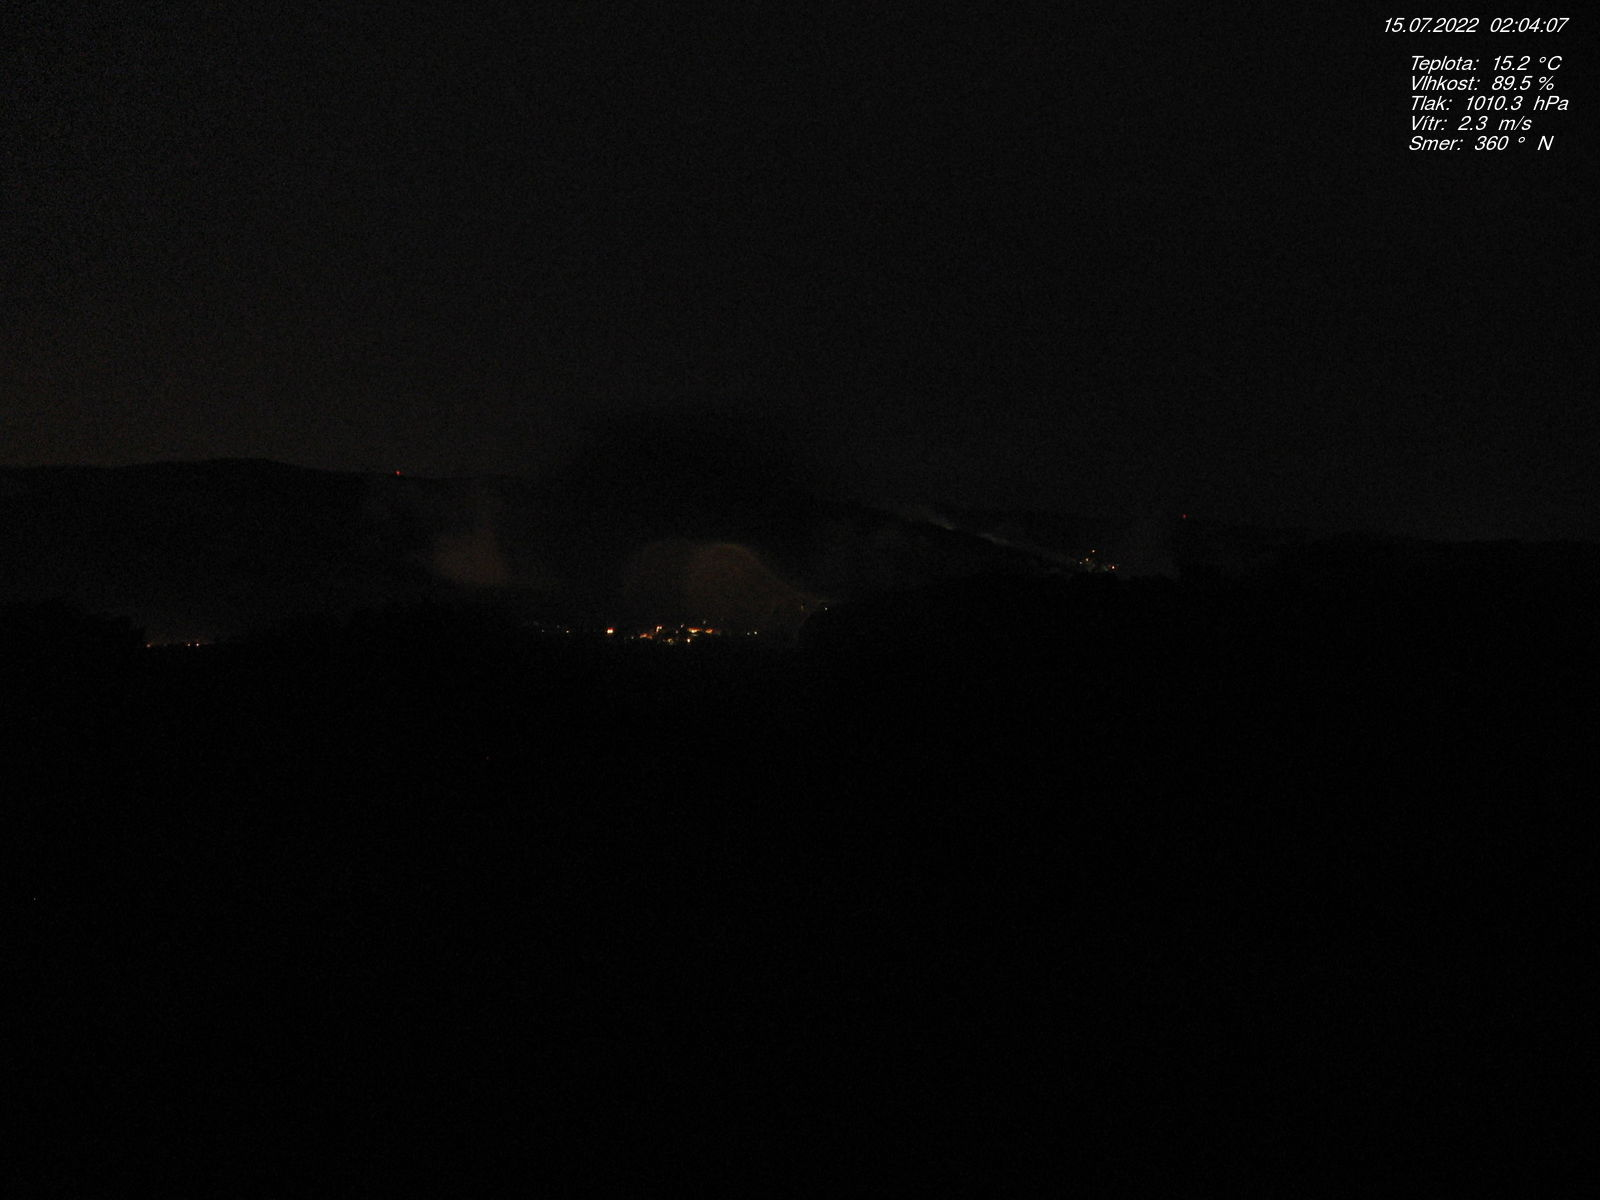 Webcam - Brumov - Bylnice